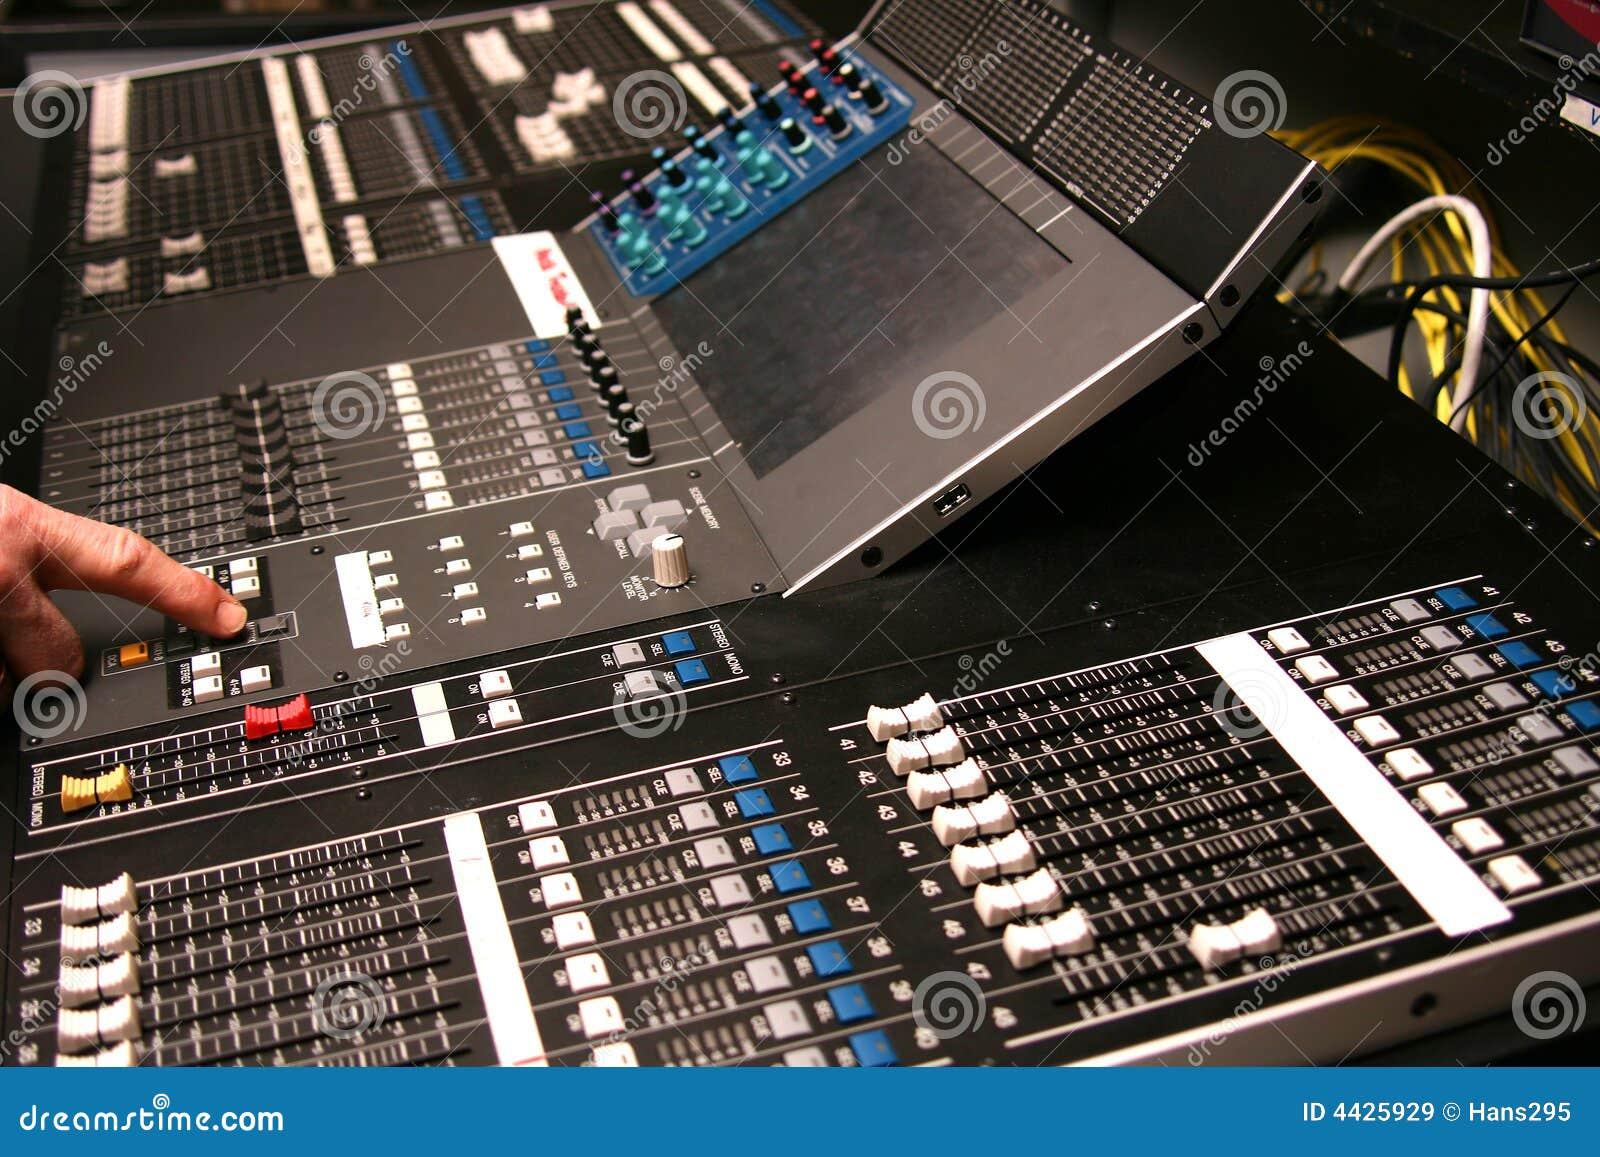 how to build an digital audio mixer